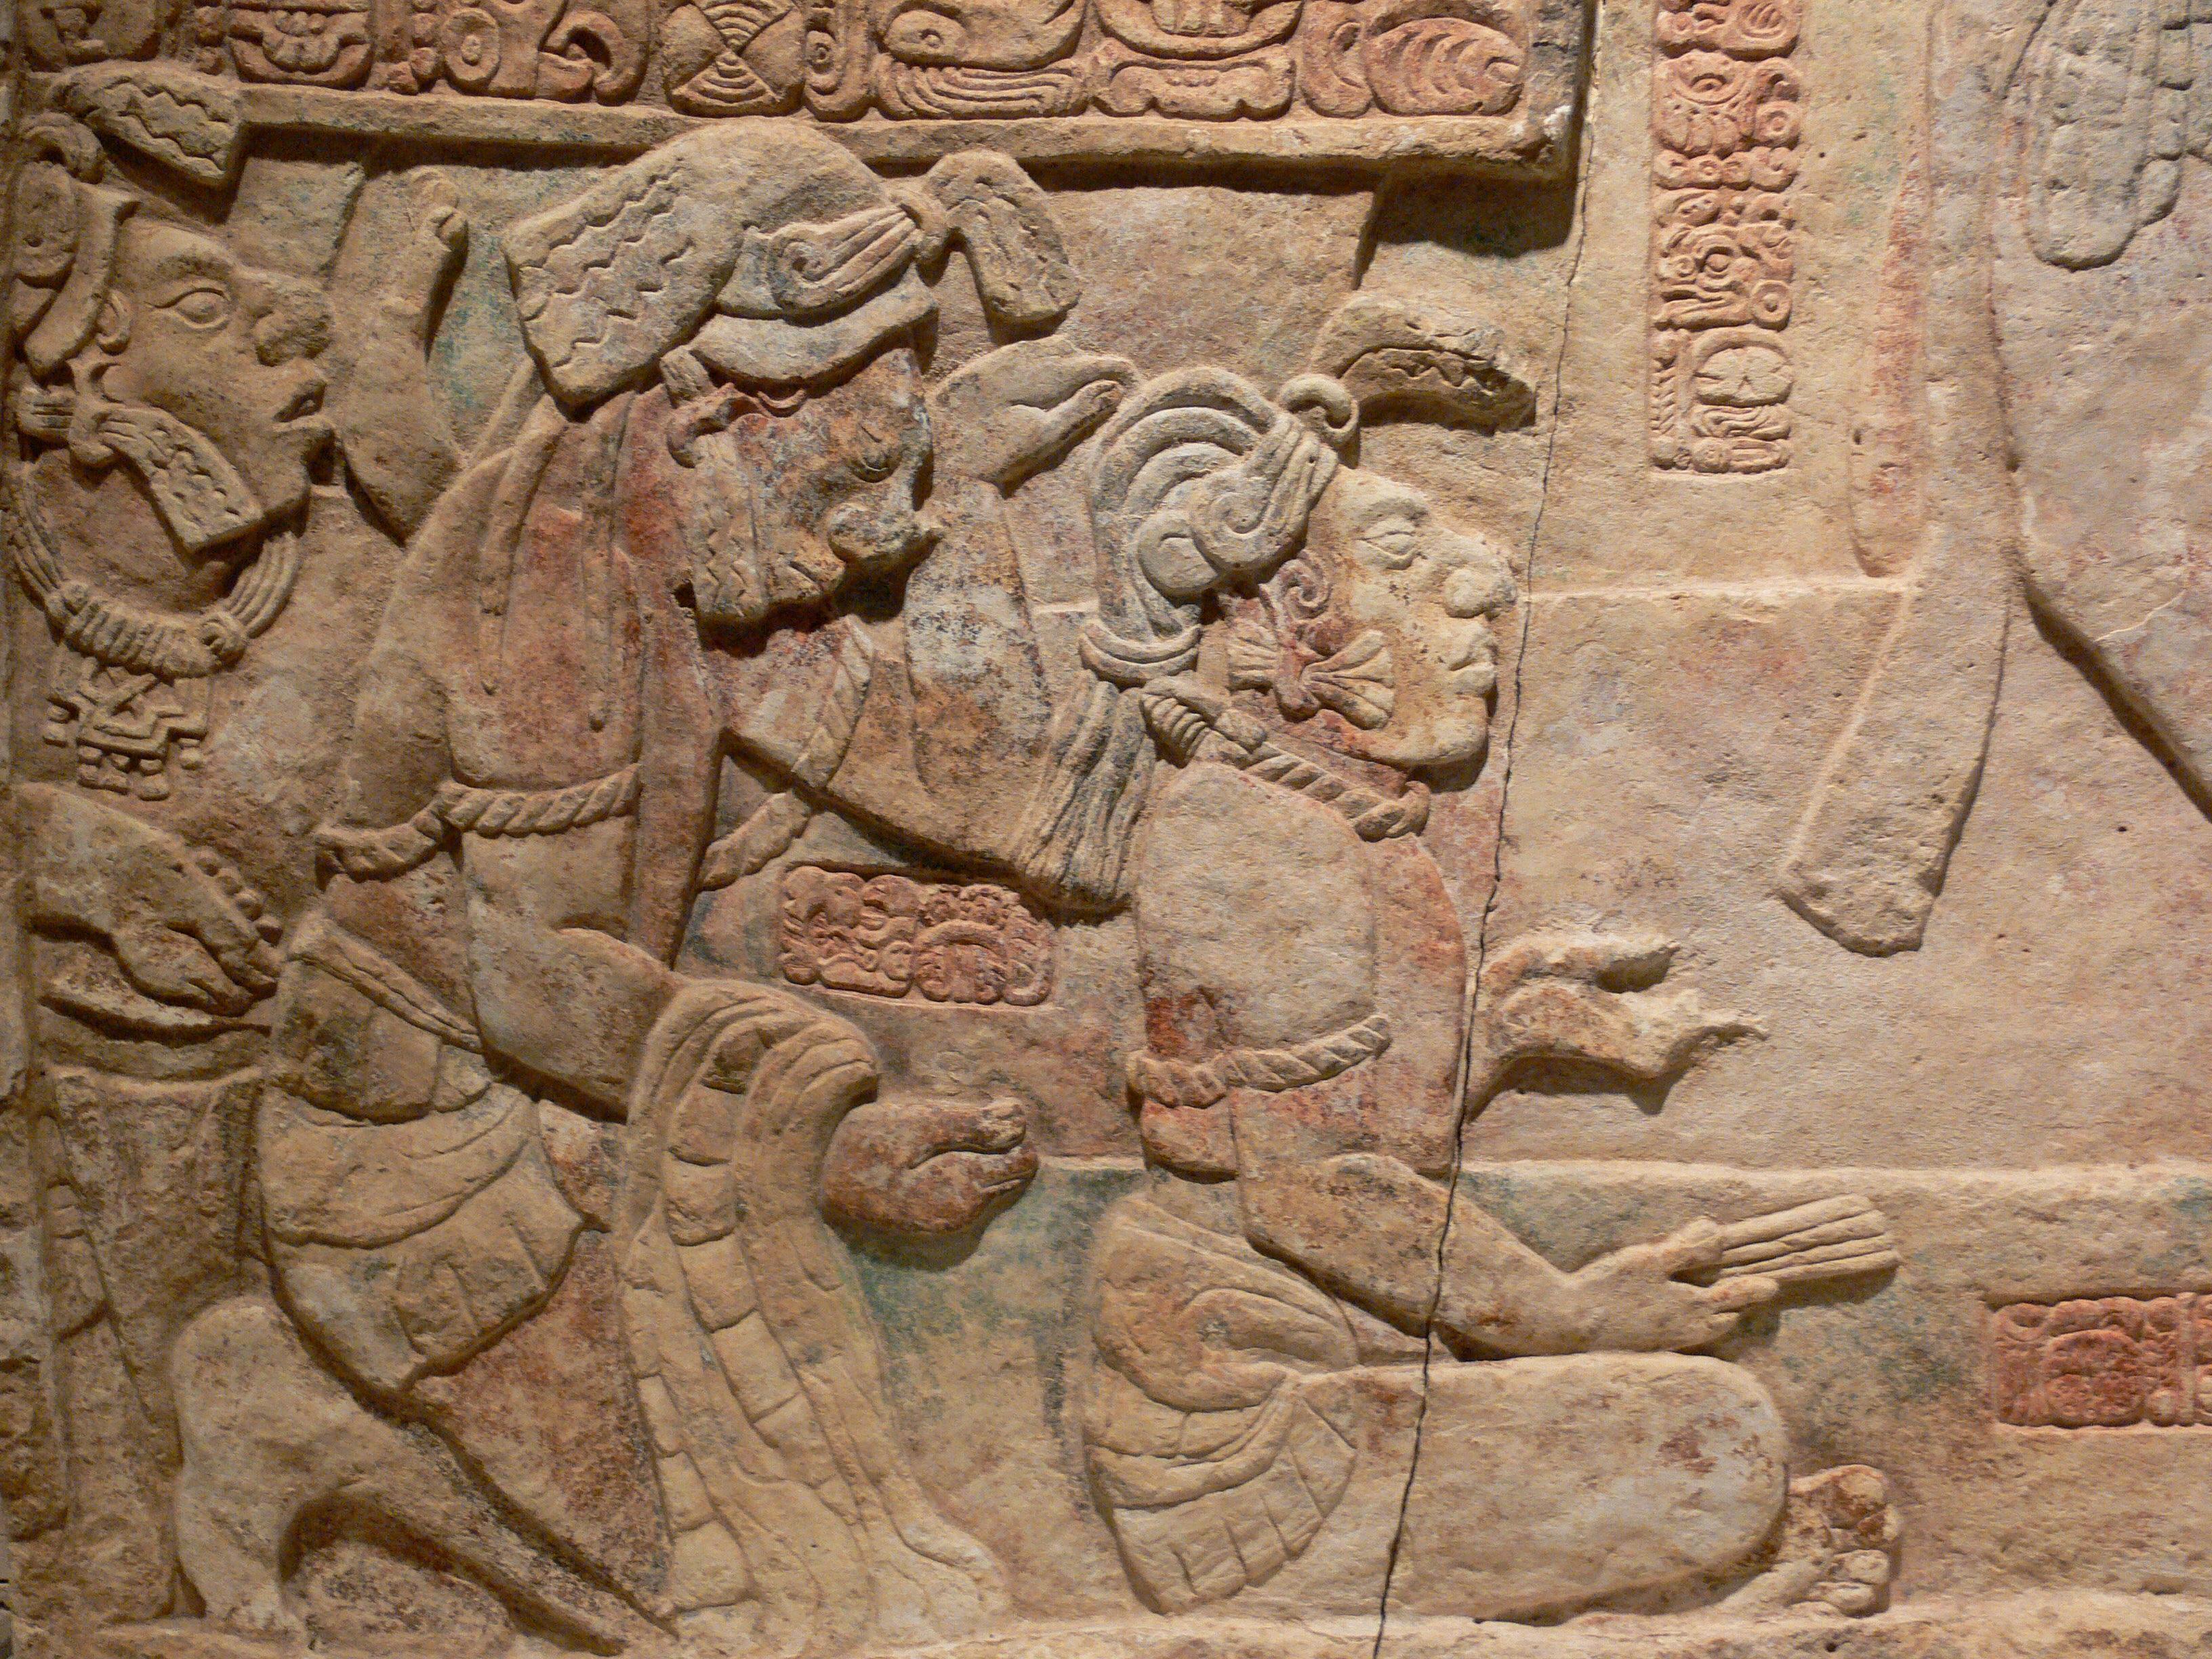 The Sacred Tzolk In Of The Maya Yellow Overtone Human